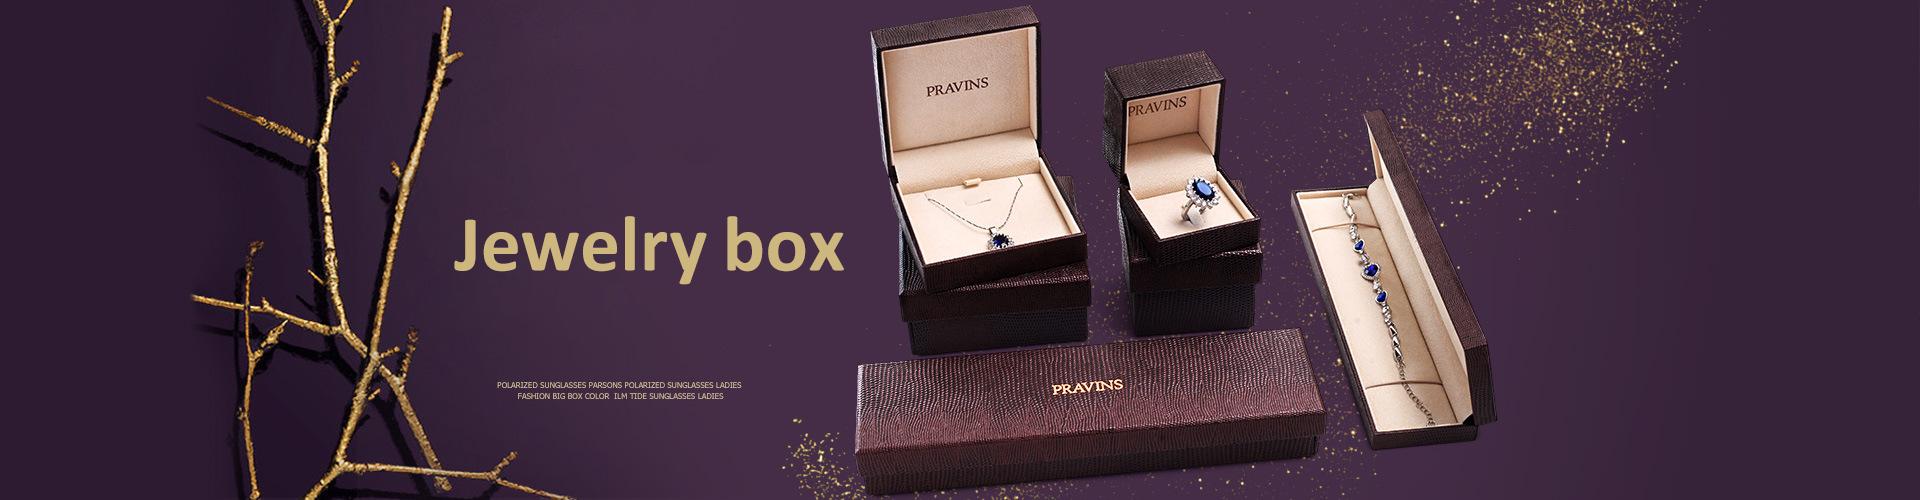 Jewelry box banner